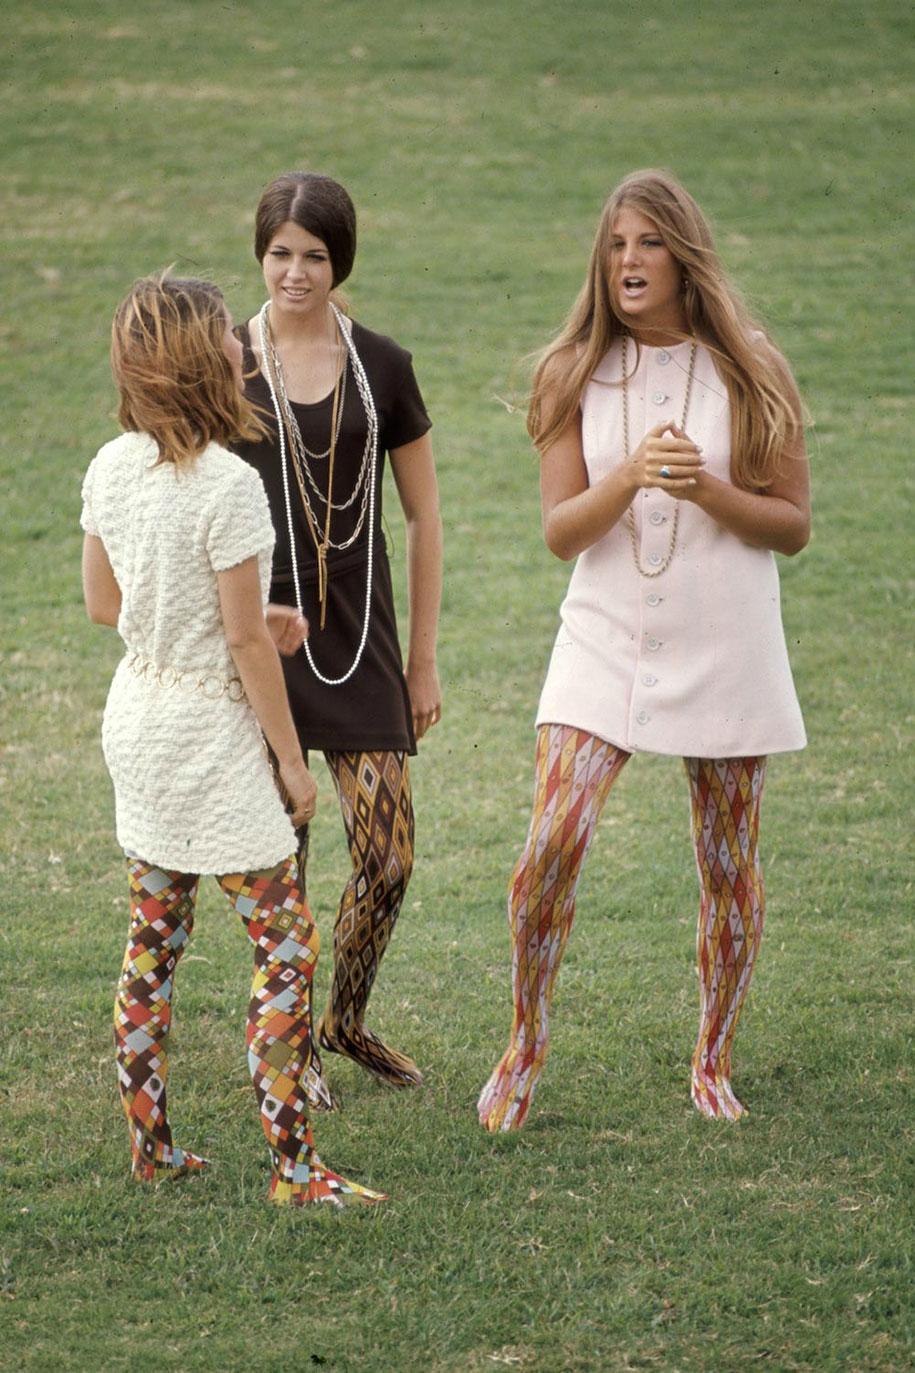 1969-hippie-high-school-counterculture-photography-10